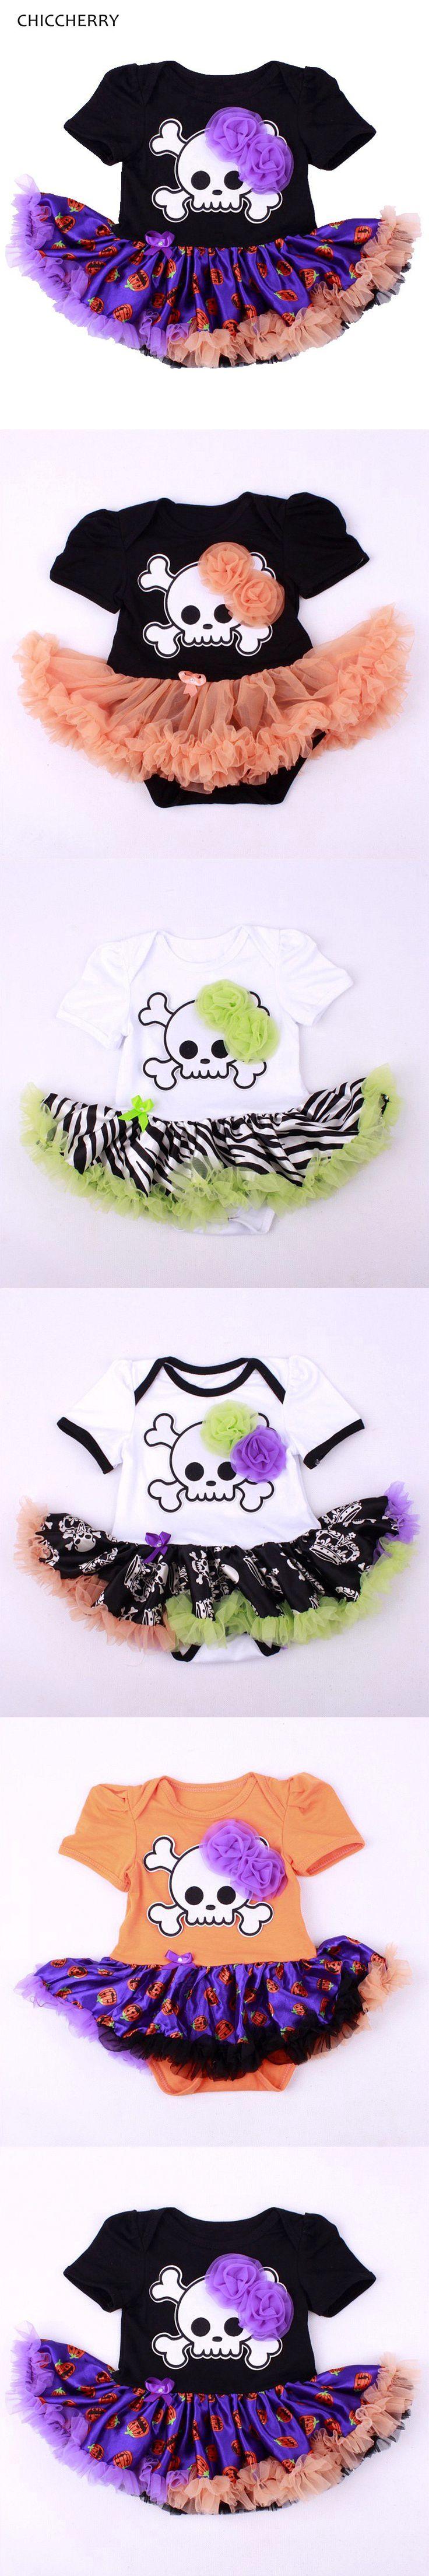 Skull Baby Halloween Costume Baby Romper Dress Baby Girl Overall Wear Girls Jumpsuit Fantasia De Bebe New Born Infant-Clothing